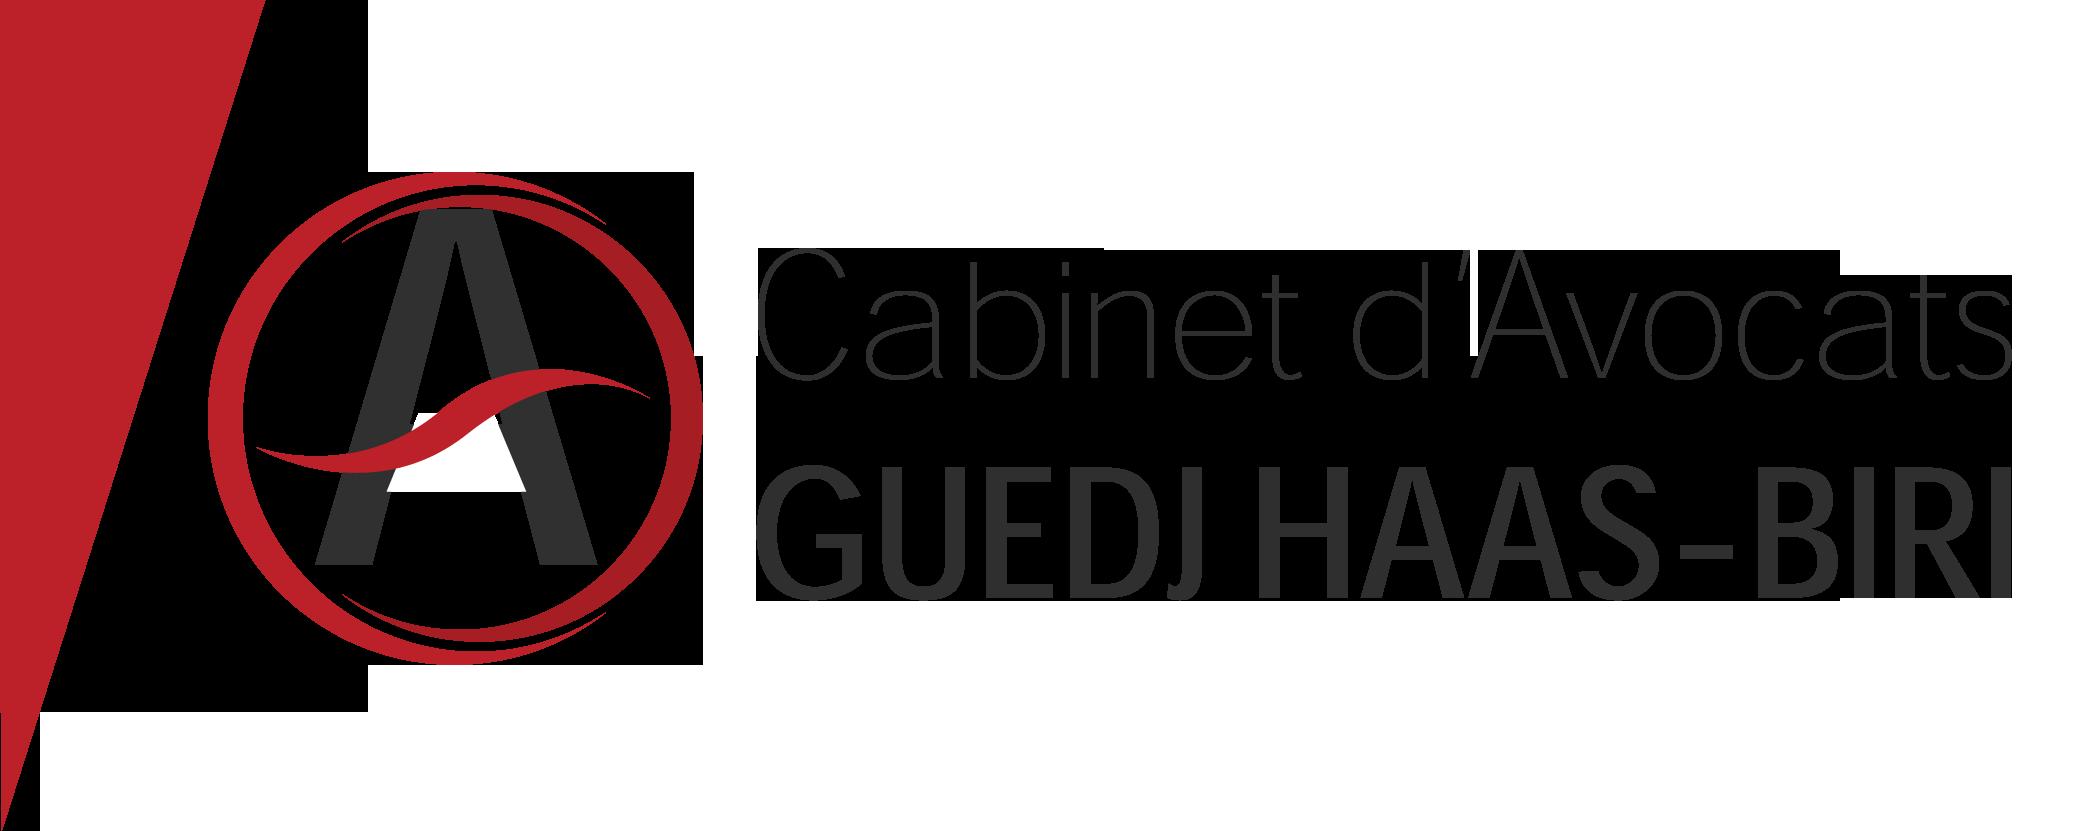 Cabinet Avocat GUEDJ HAAS-BIRI